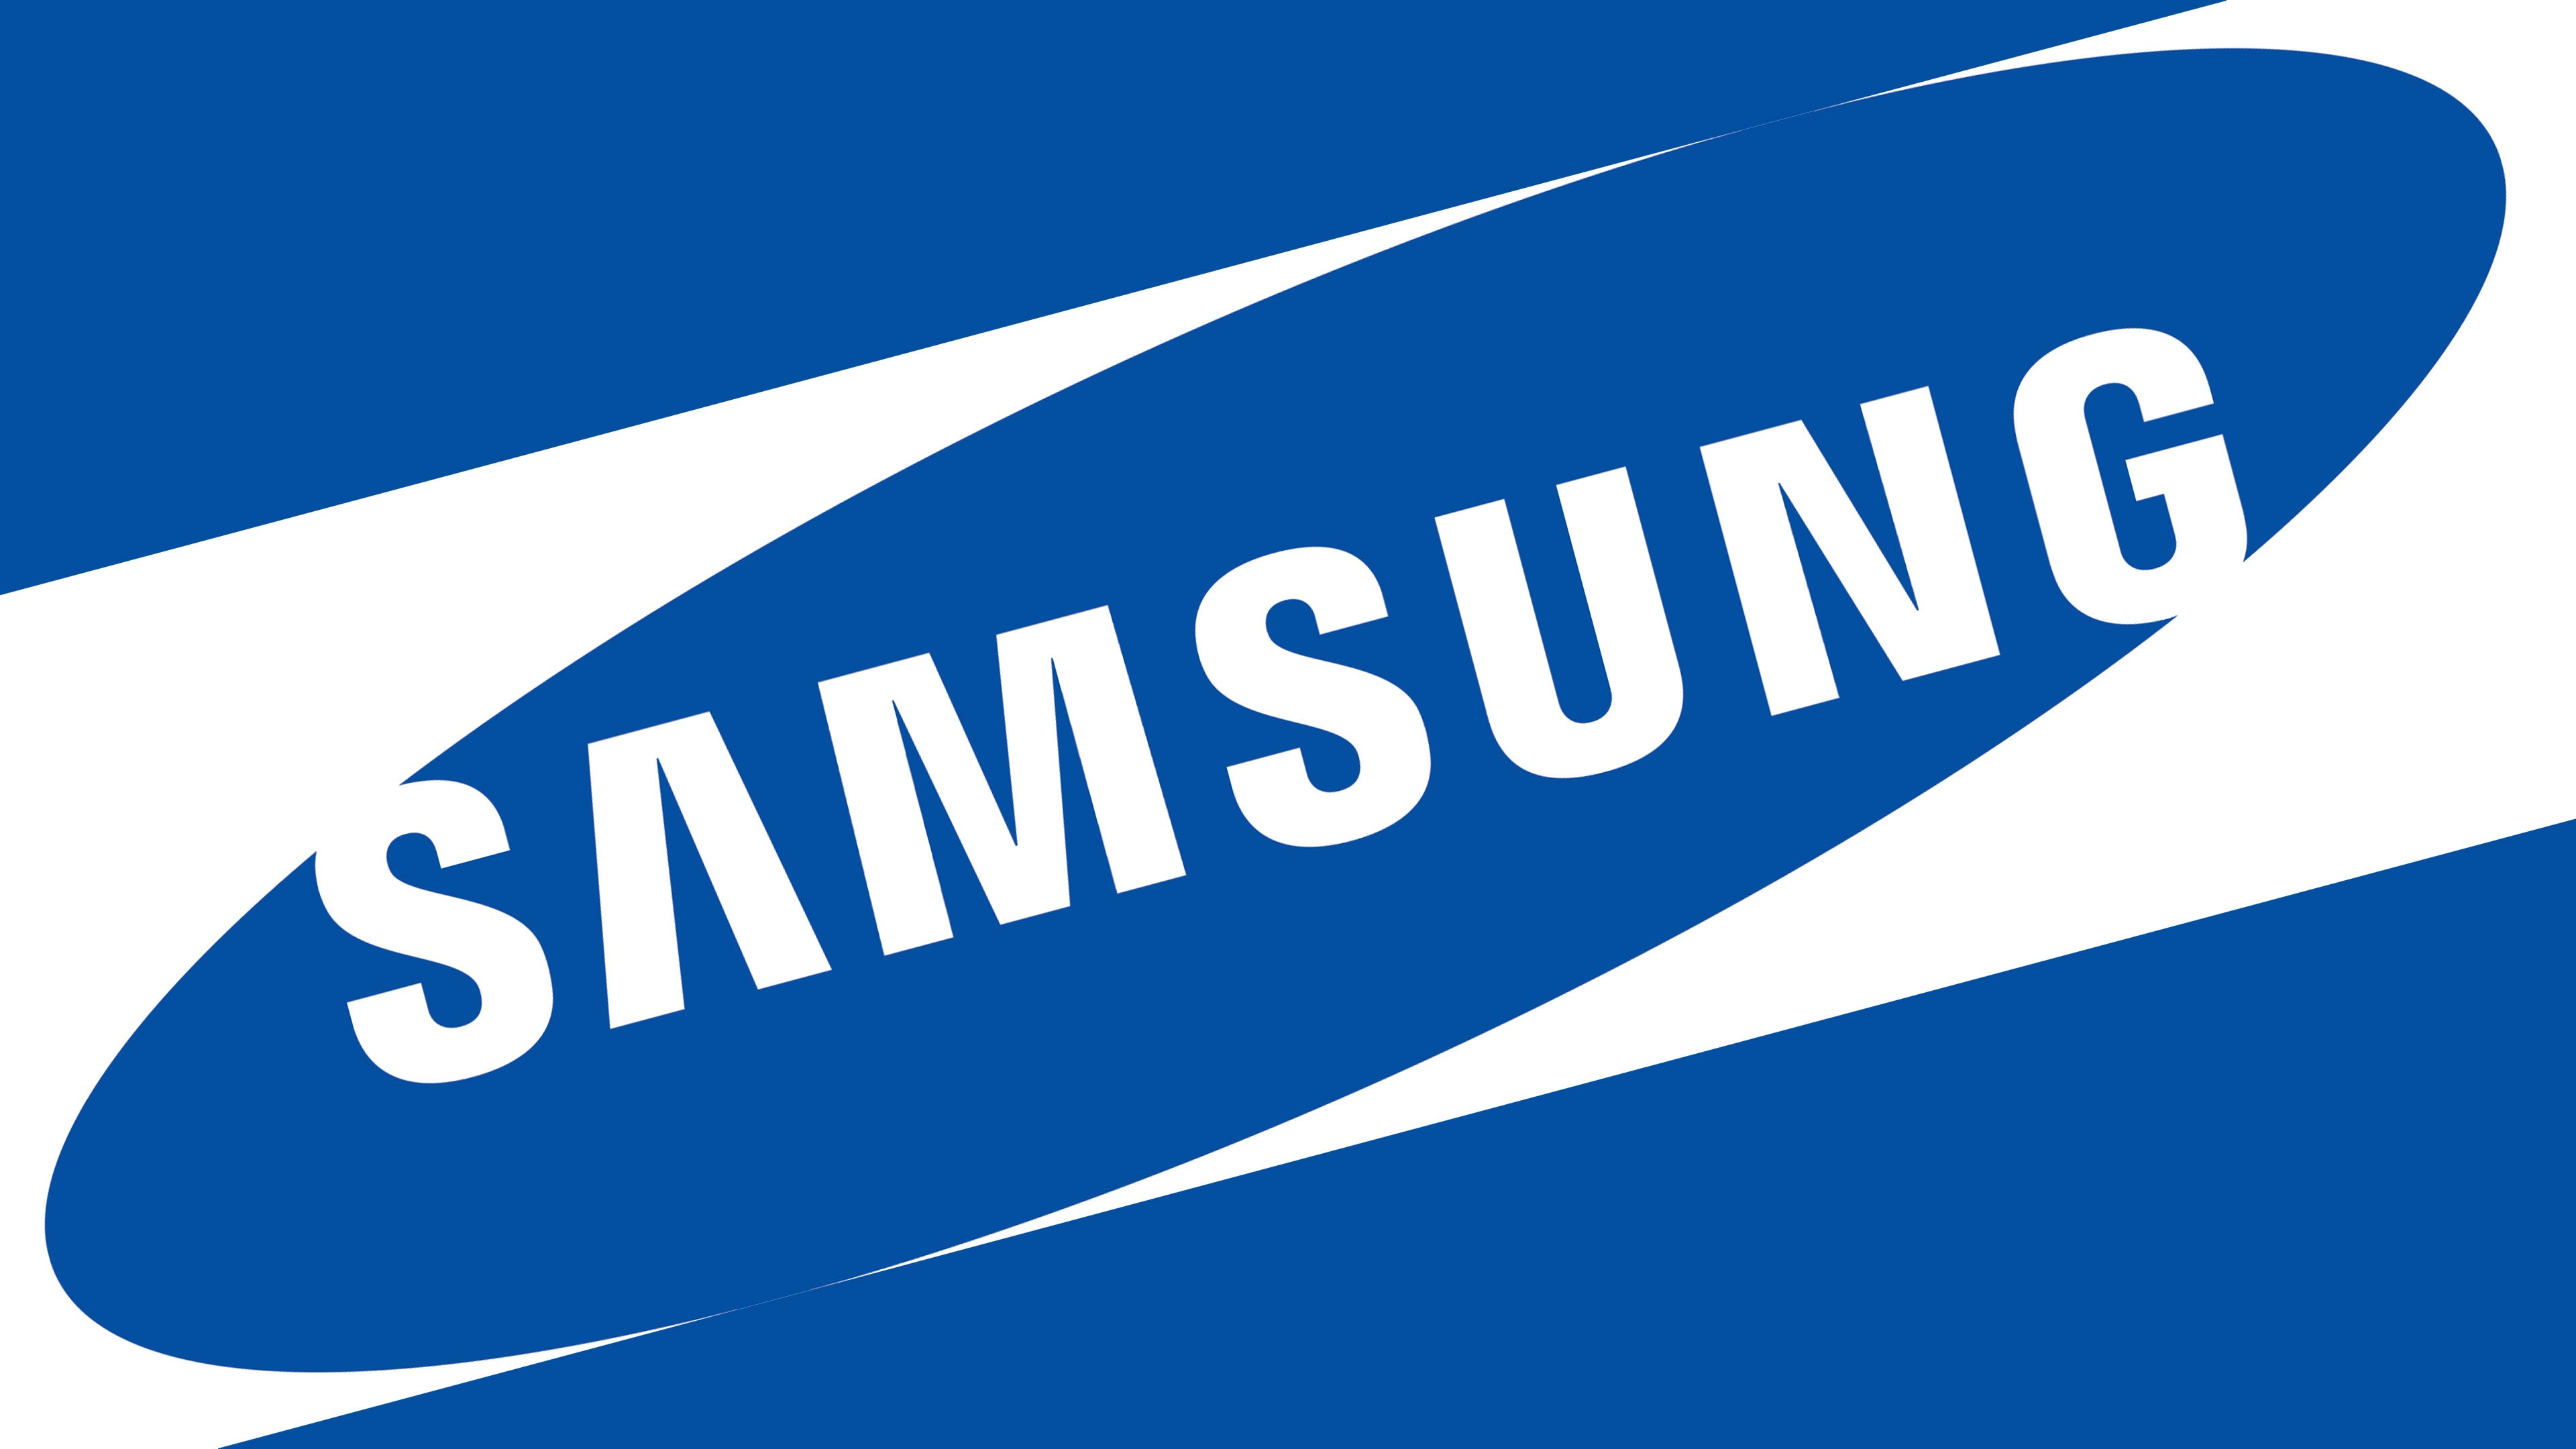 Fh Logo Samsung Mobile: Download Wallpaper 3840x2160 Samsung Logo UHD 4K Background